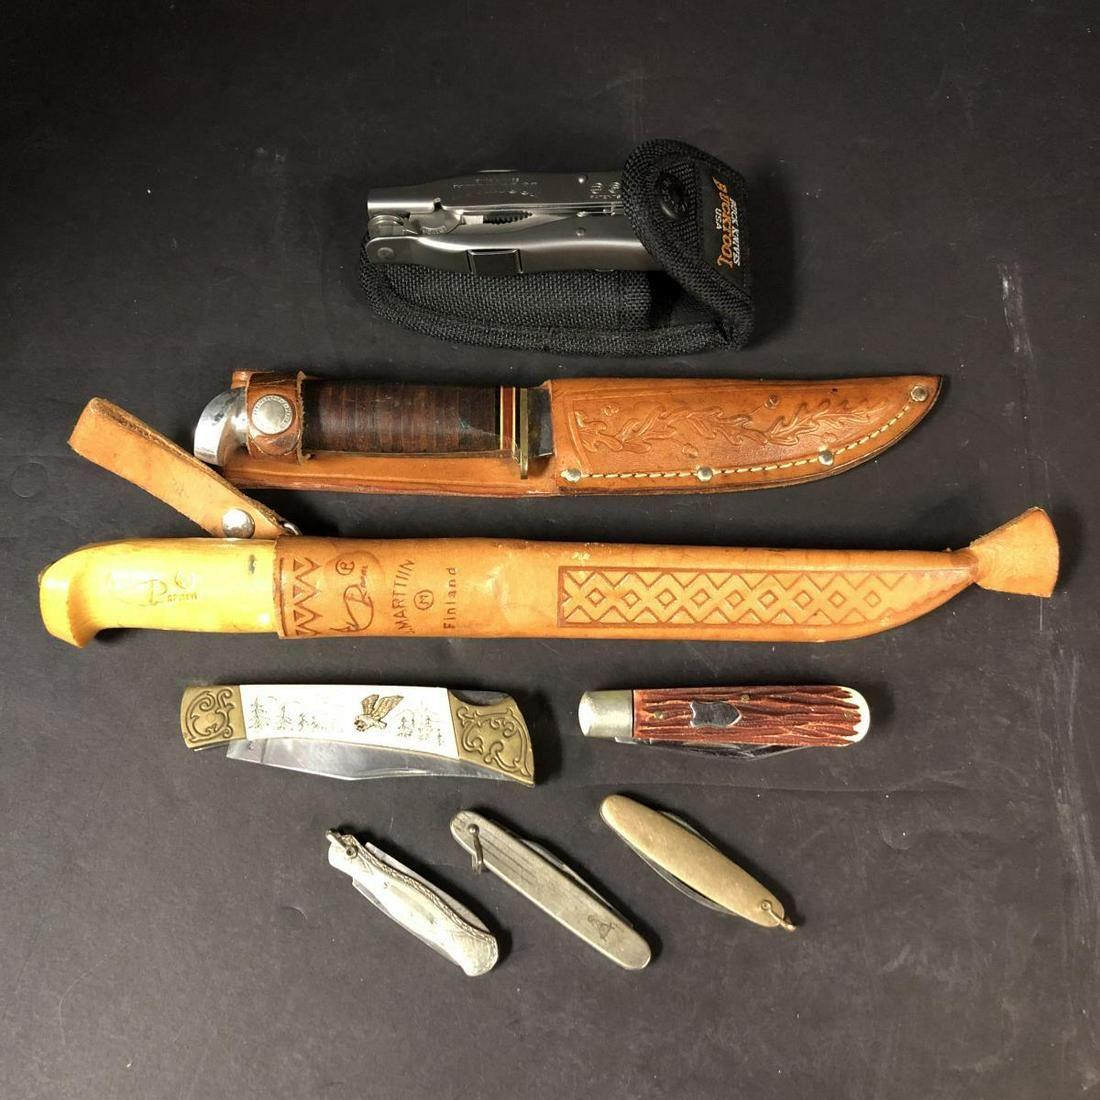 Lot of Vintage Knives, Pocket Knives and Bucktool